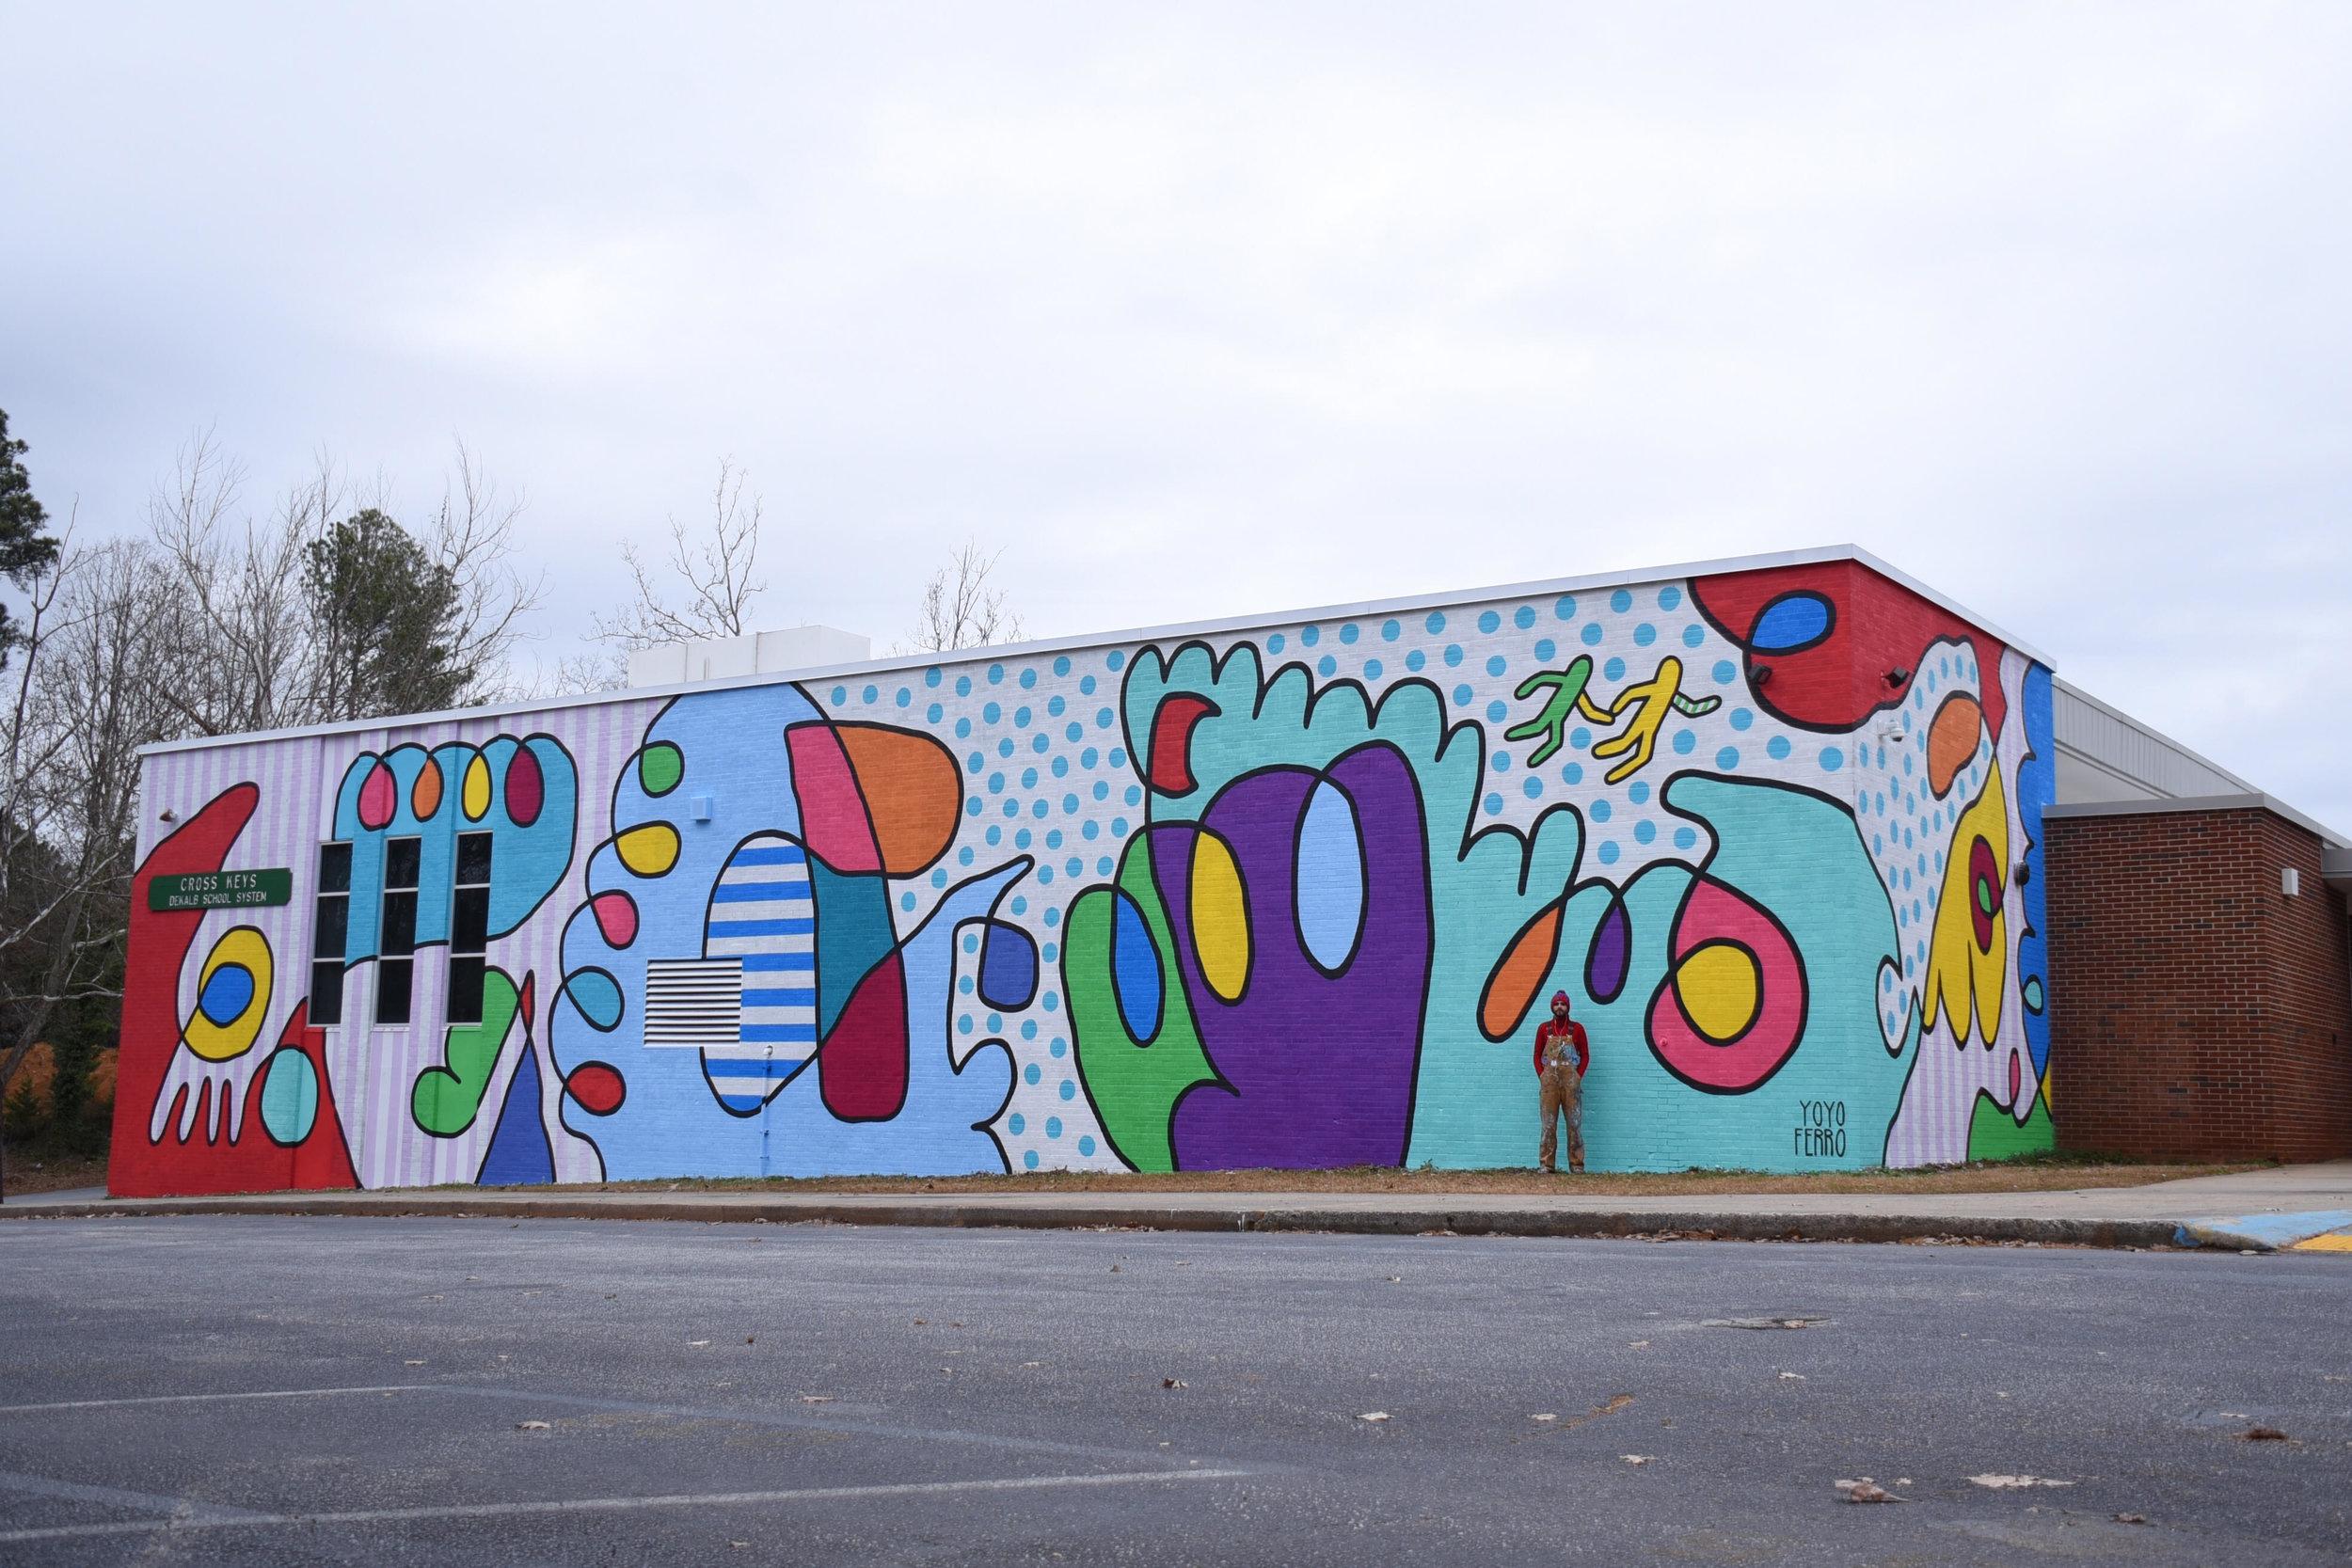 1626 N Druid Hills Rd NE, Atlanta, GA 30319, USA ( Cross Keys High School  for  Living Walls )